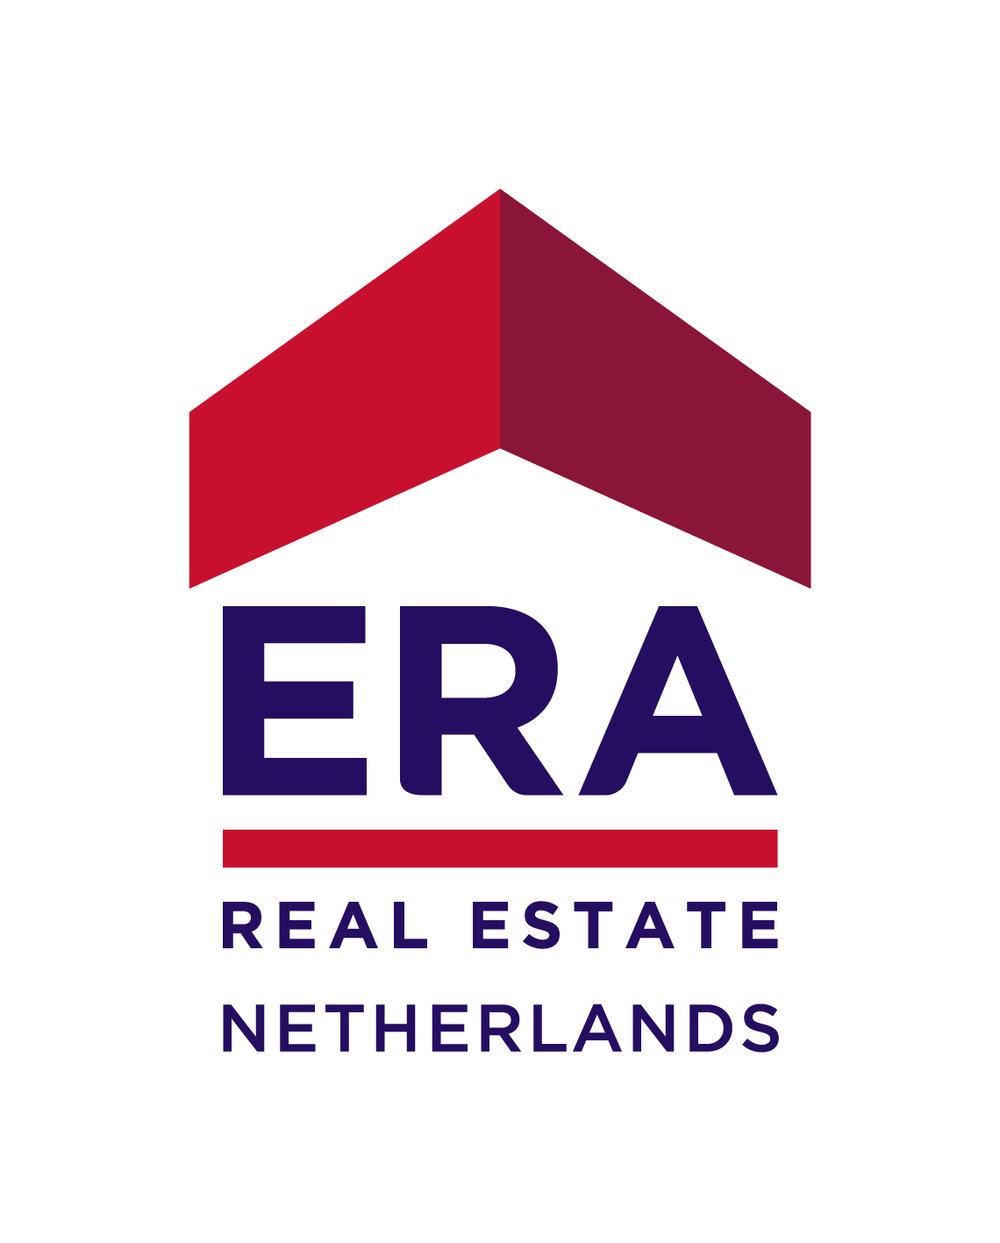 ERA Real Estate Netherlands RGB.jpg